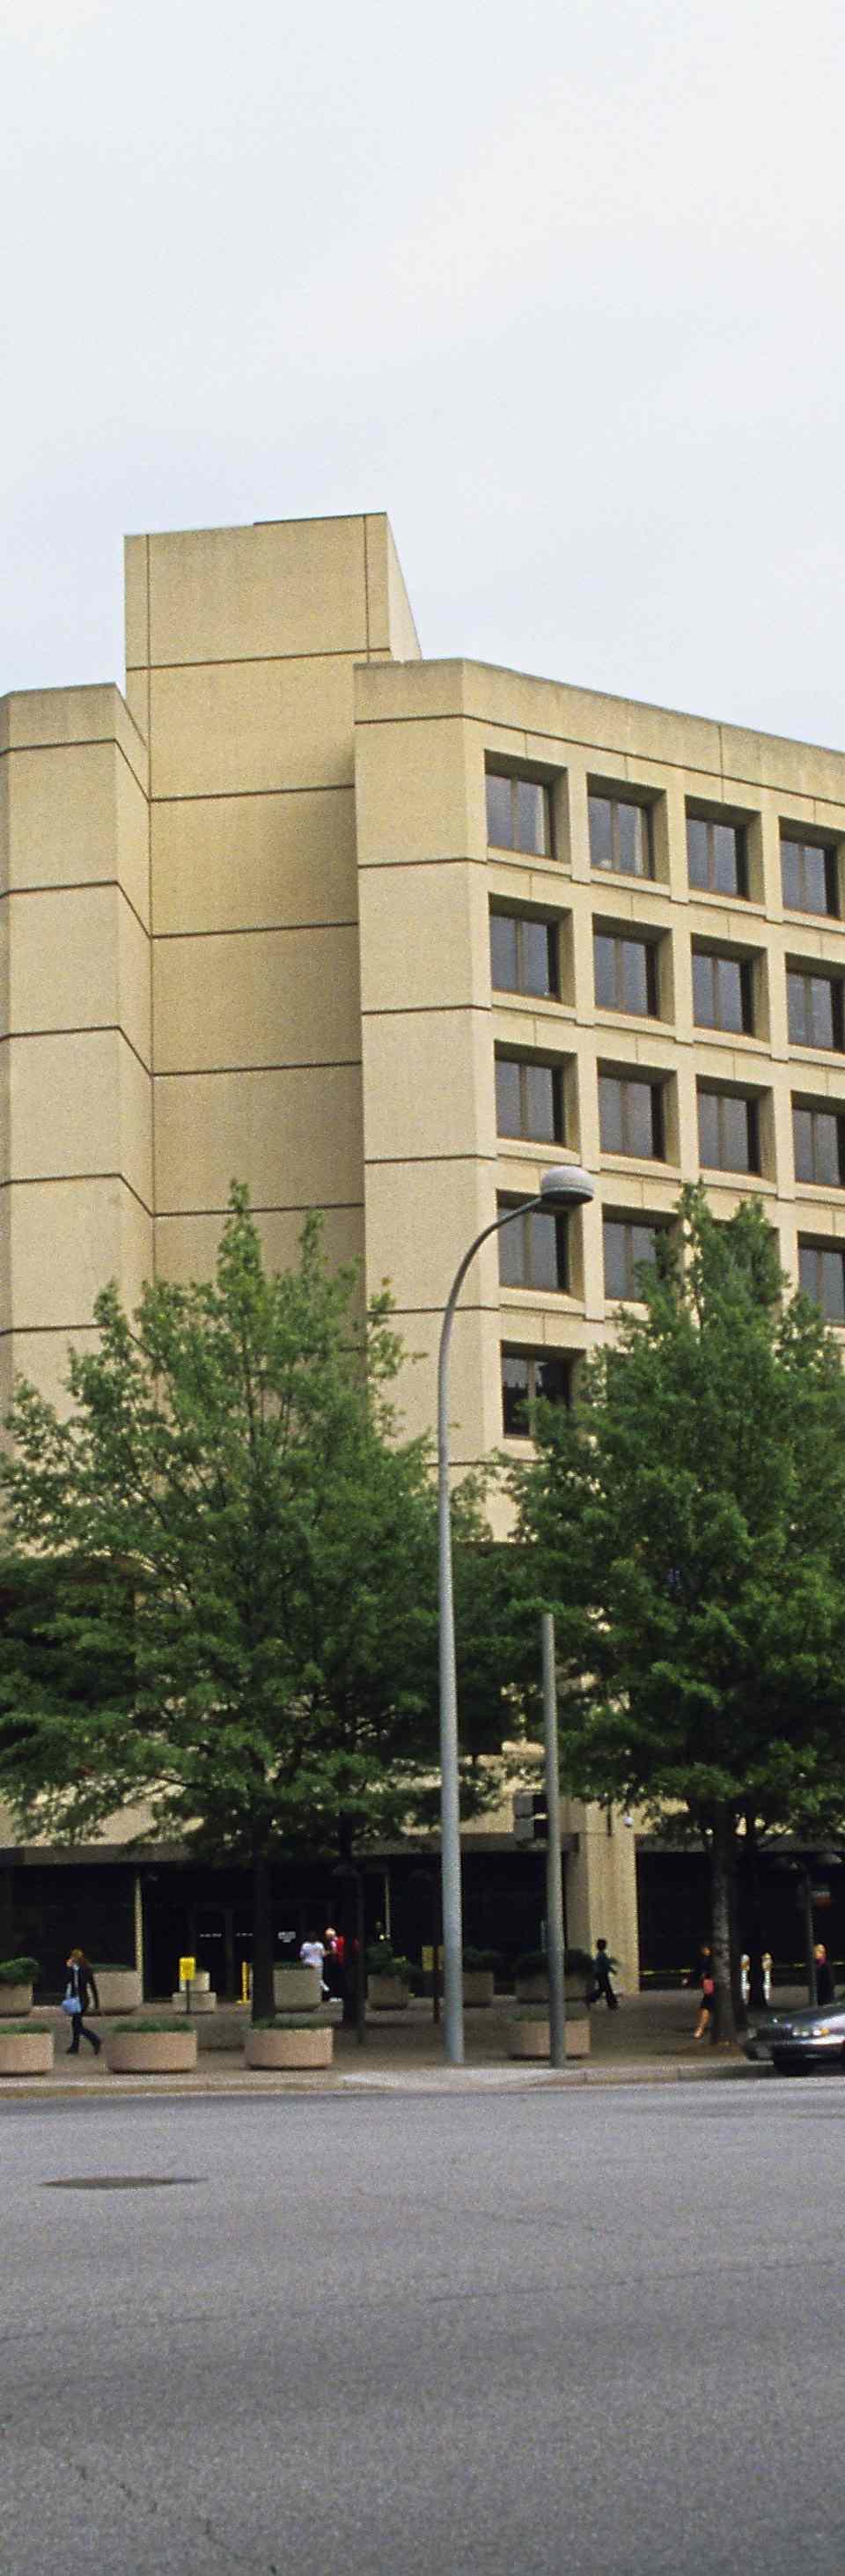 FBI Headquarters in Washington DC